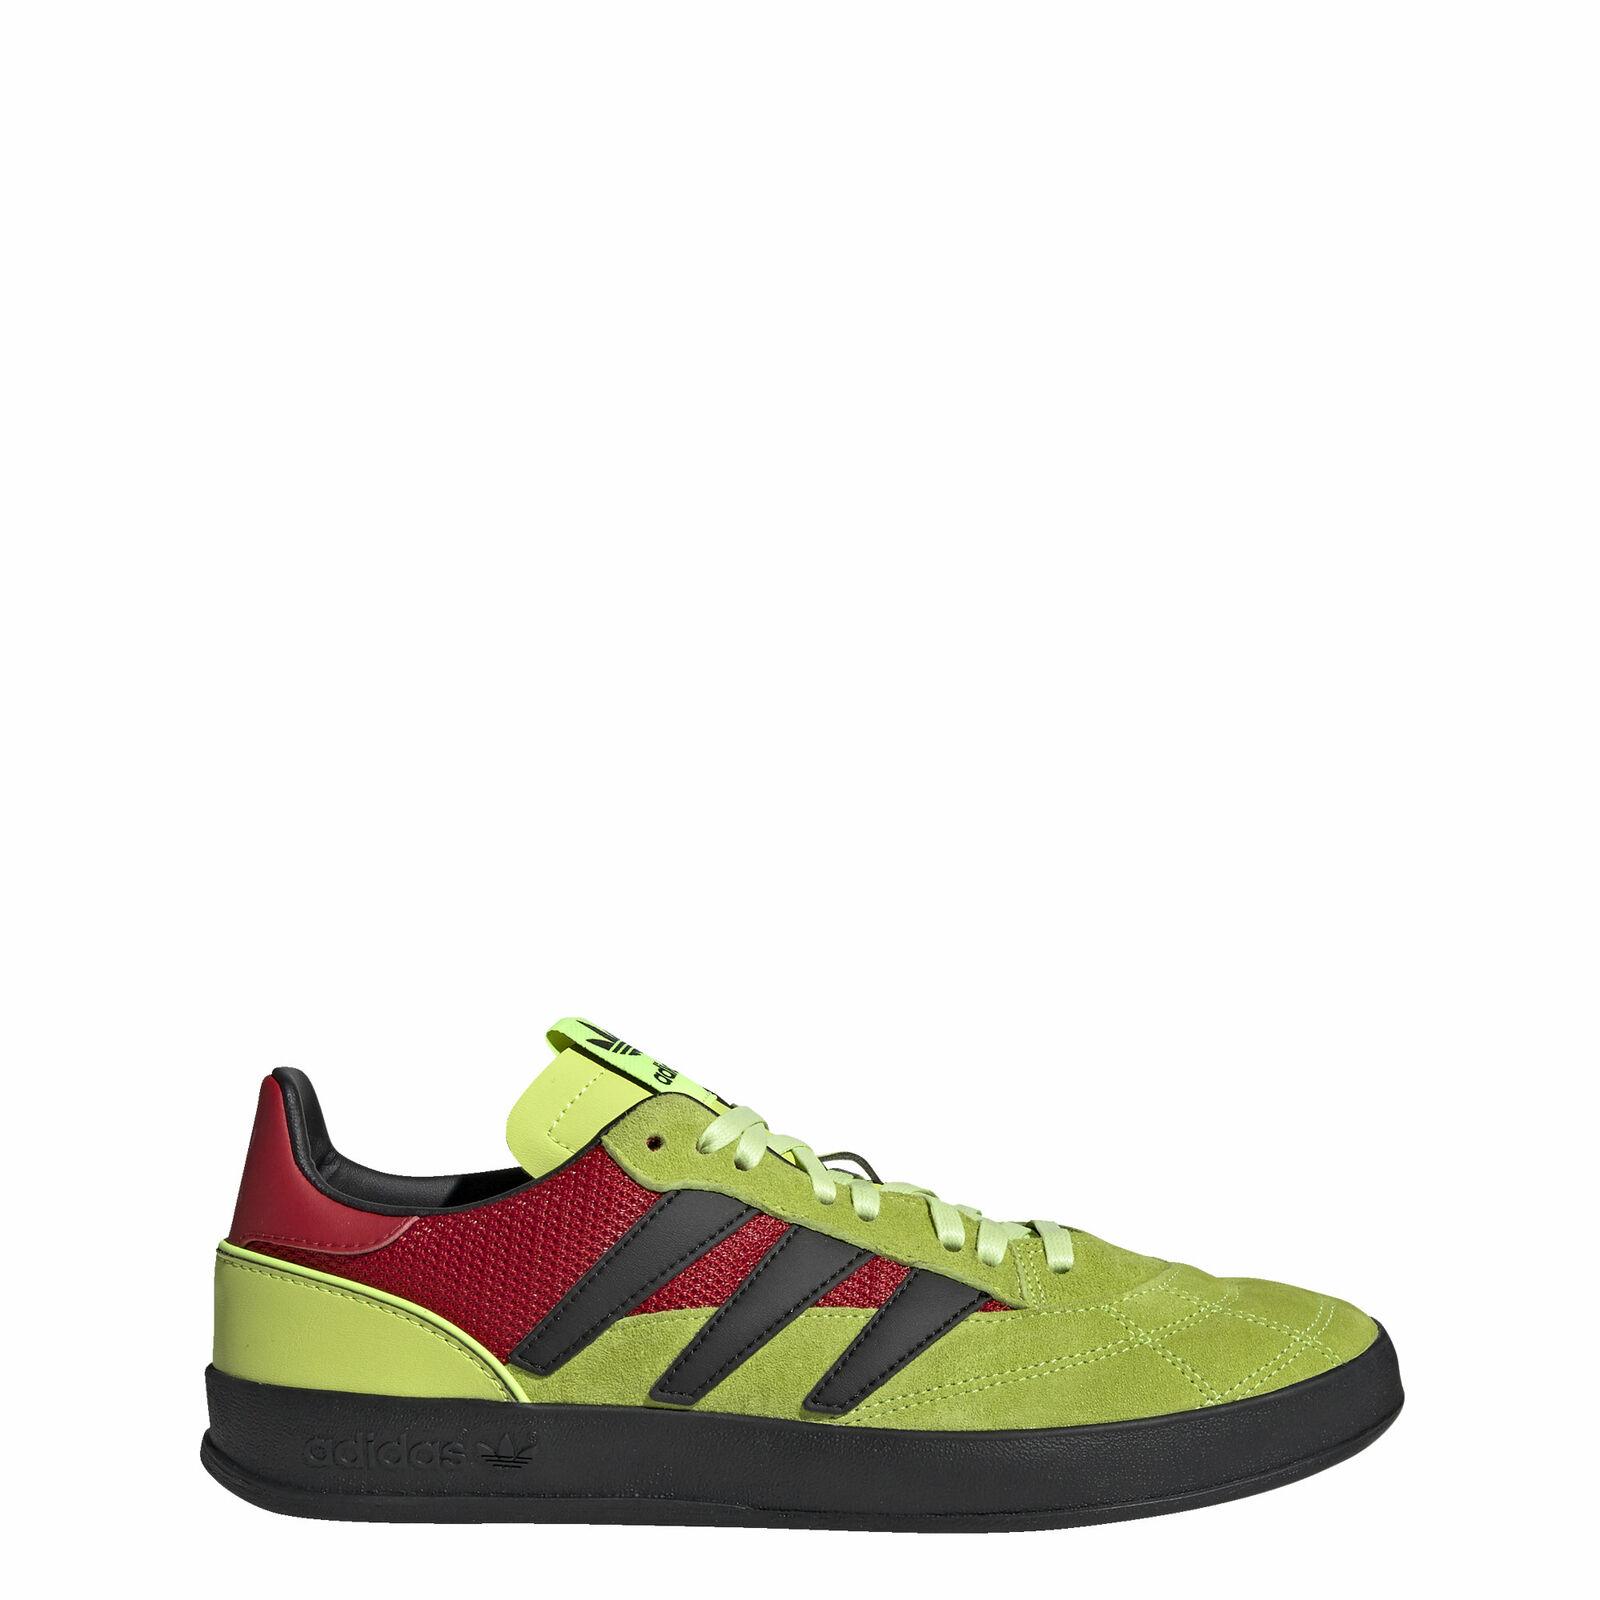 Adidas Originals Sobakov P94 Schuh Herren Trainers;Lifestyle Trainers Gelb